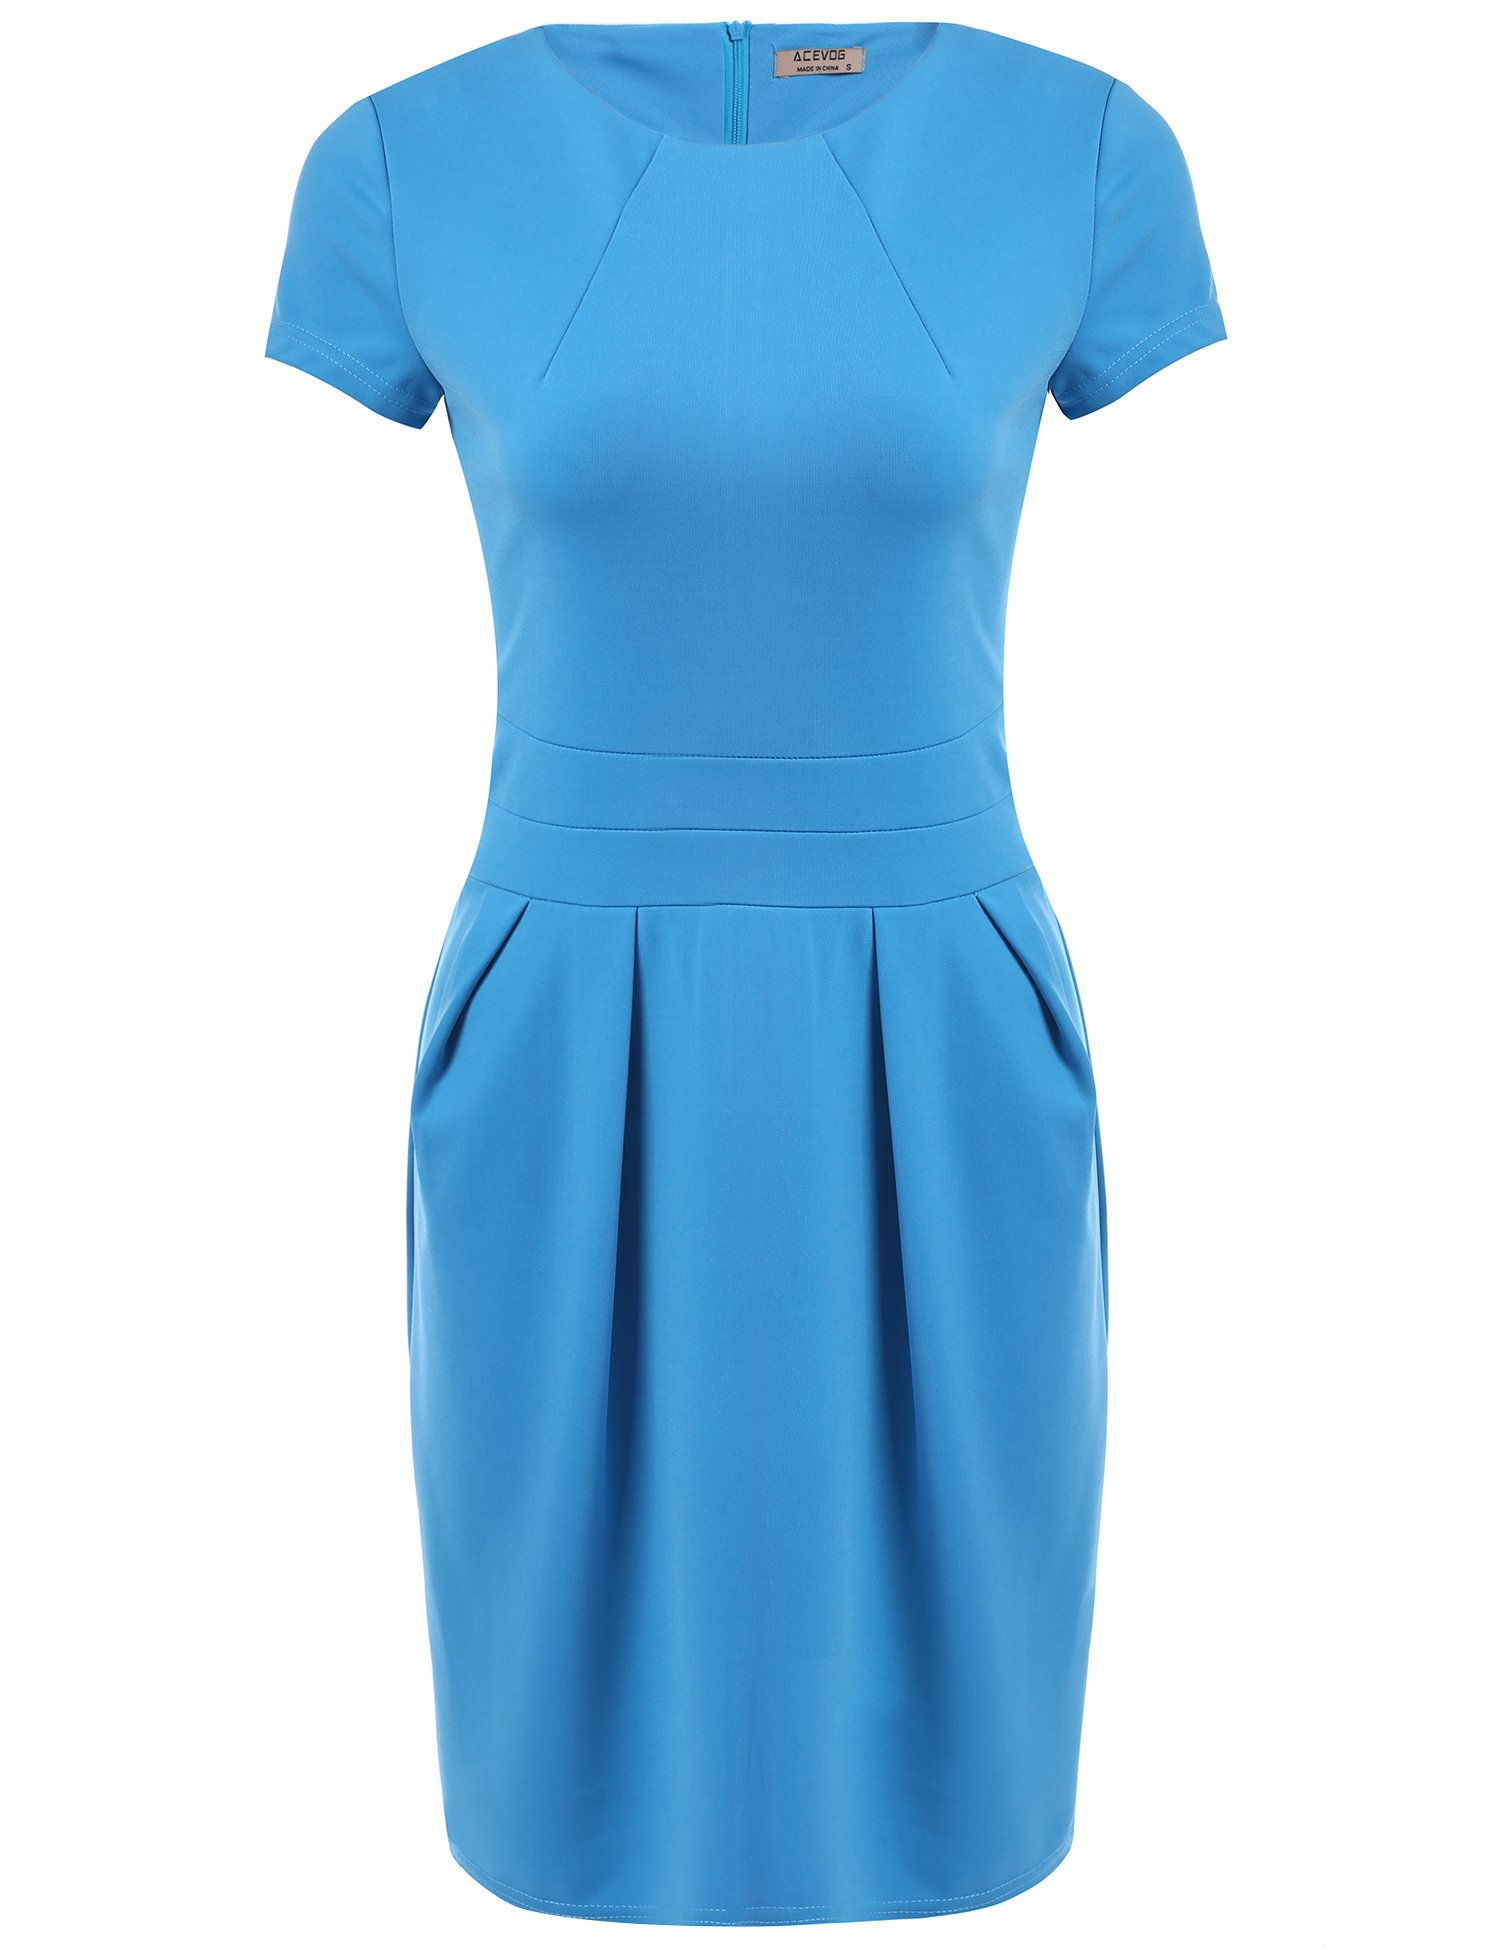 ACEVOG Women's Color Office Workwear Short Sleeve Sheath Business Dress